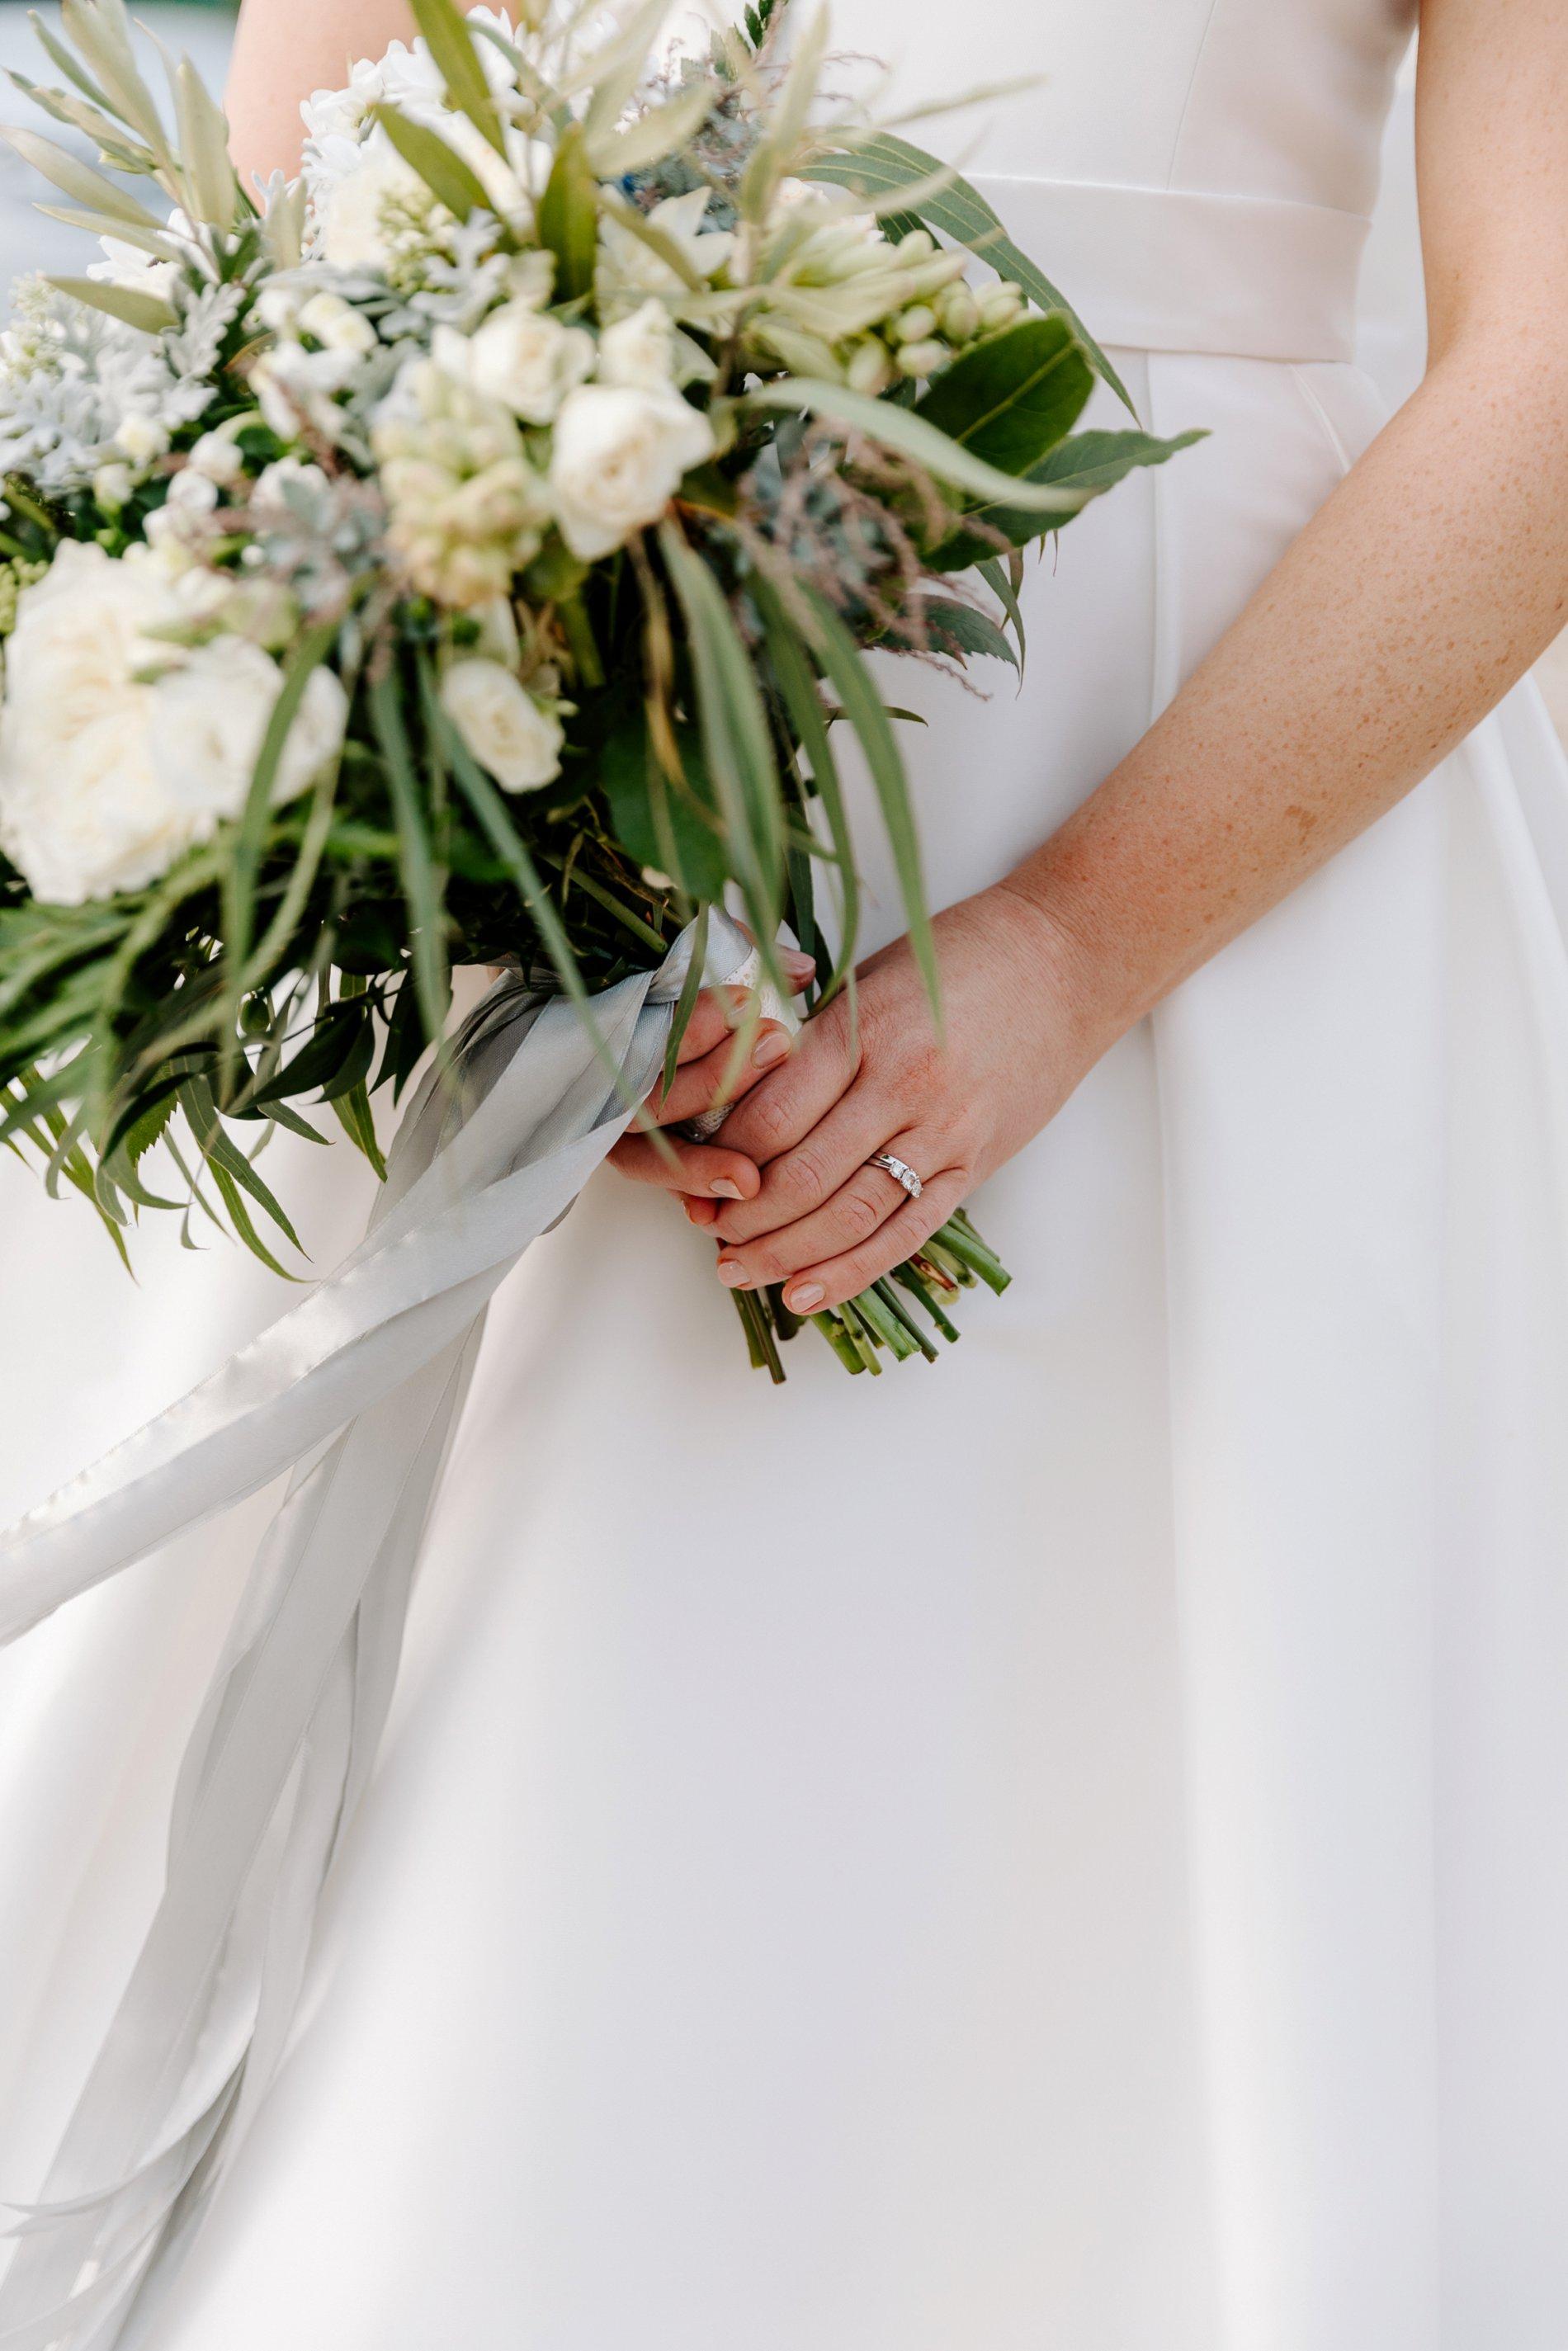 An Elegant White Wedding at Thicket Priory (c) Carla Whittingham Photography (80)